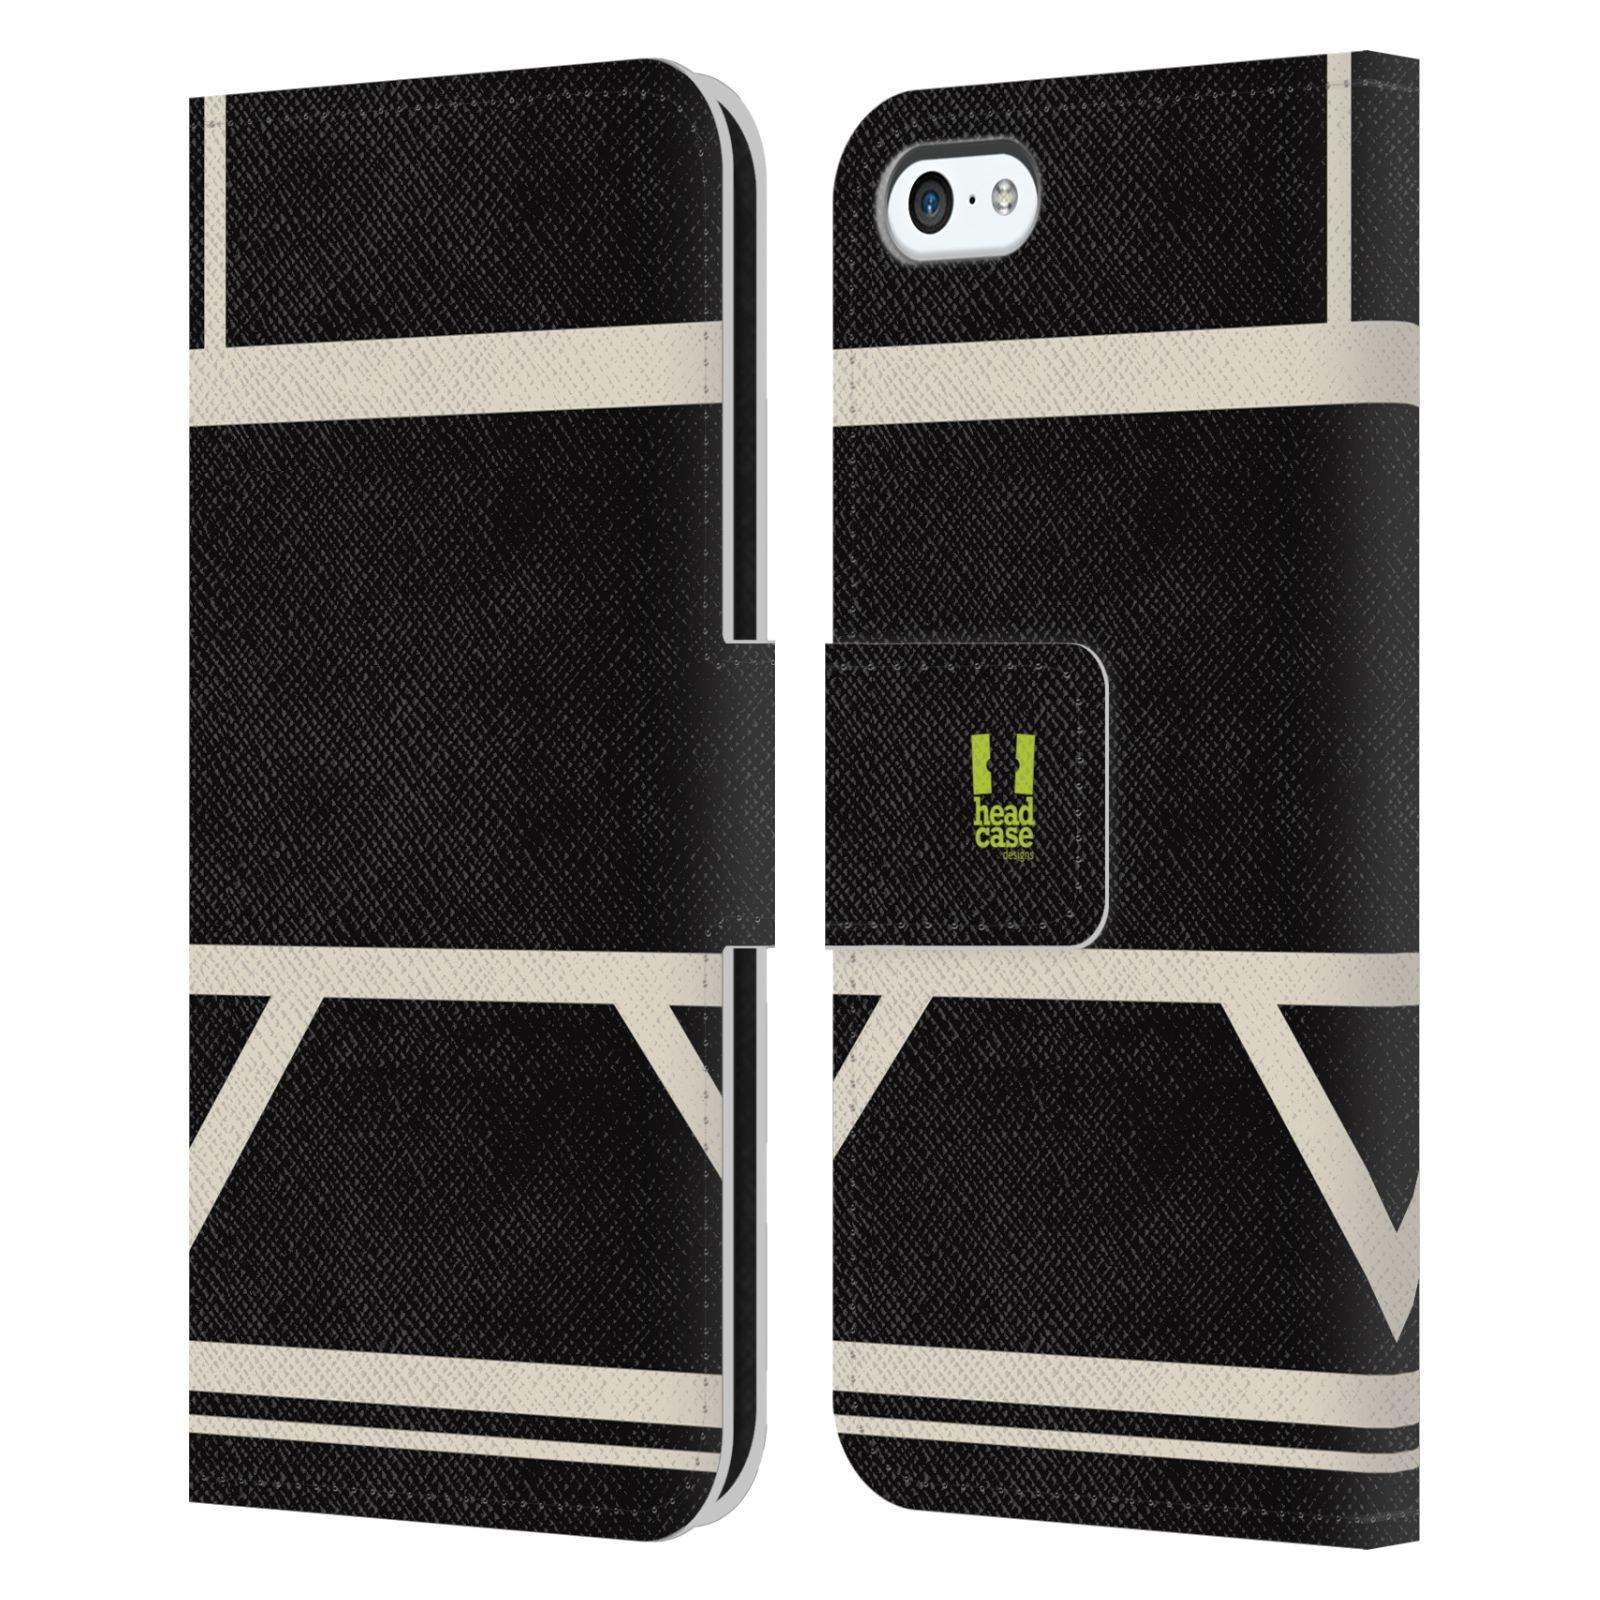 HEAD CASE Flipové pouzdro pro mobil Apple Iphone 5C barevné tvary černá a bílá proužek